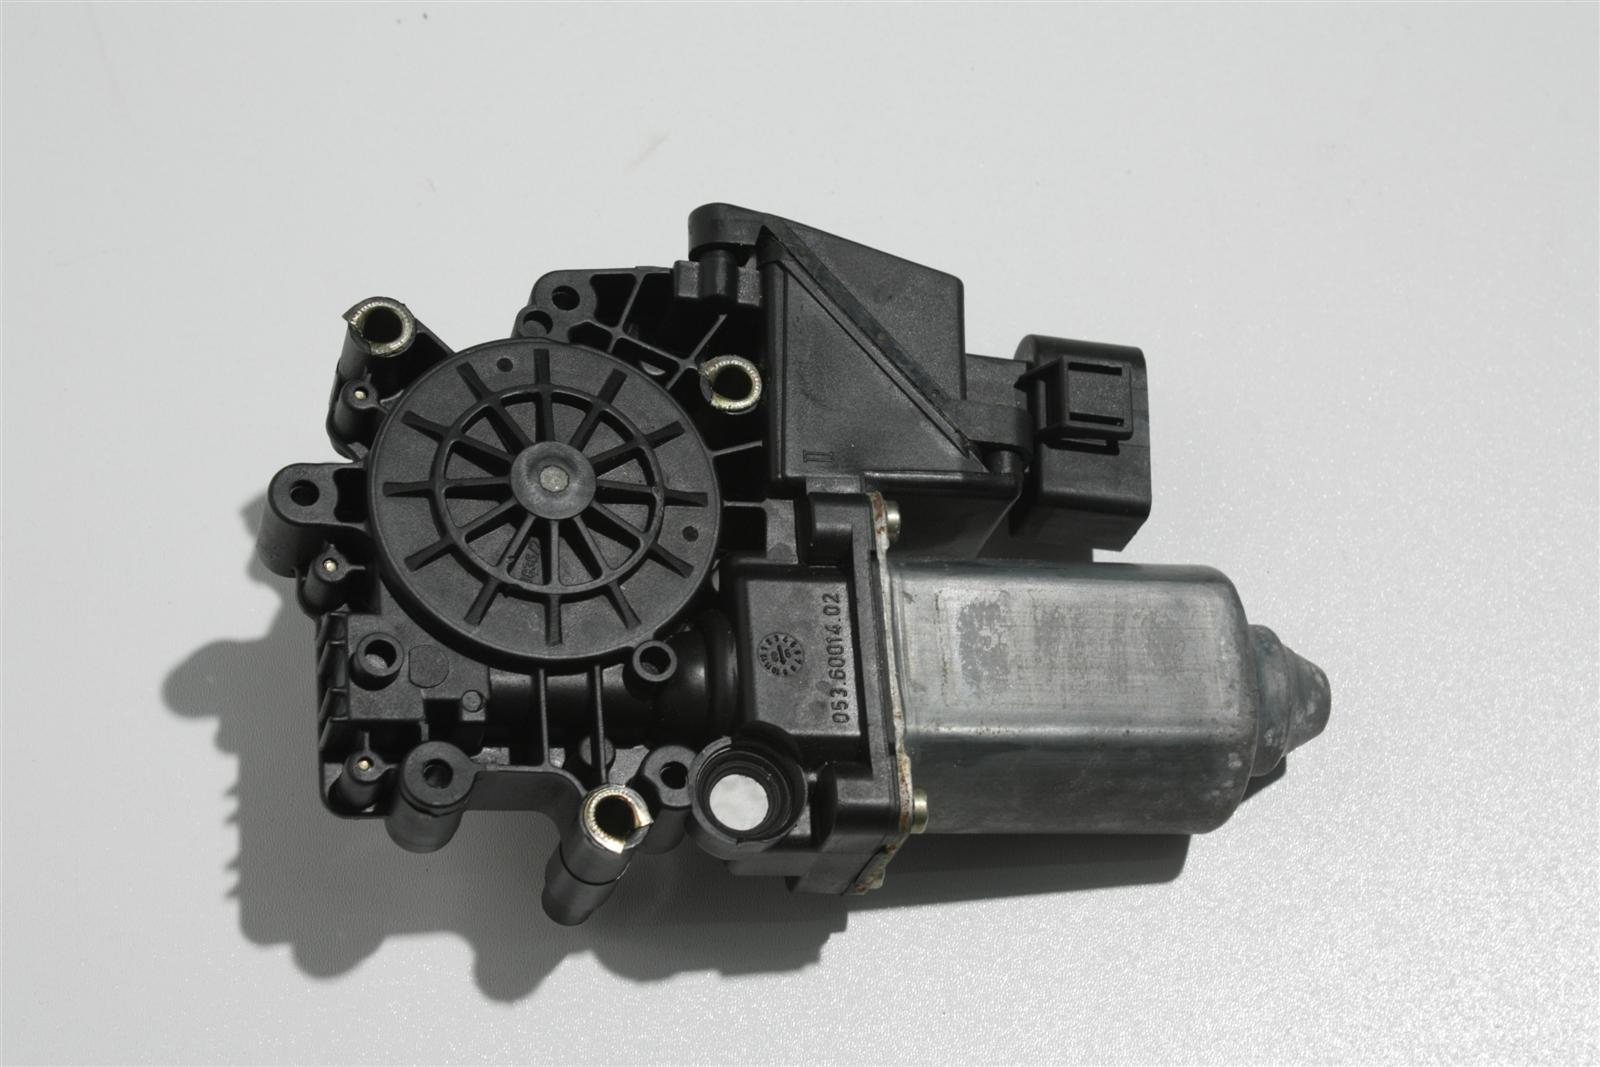 Audi A4 B5 Fensterhebermotor Vorne Links 8D0959801D 8D0959801B